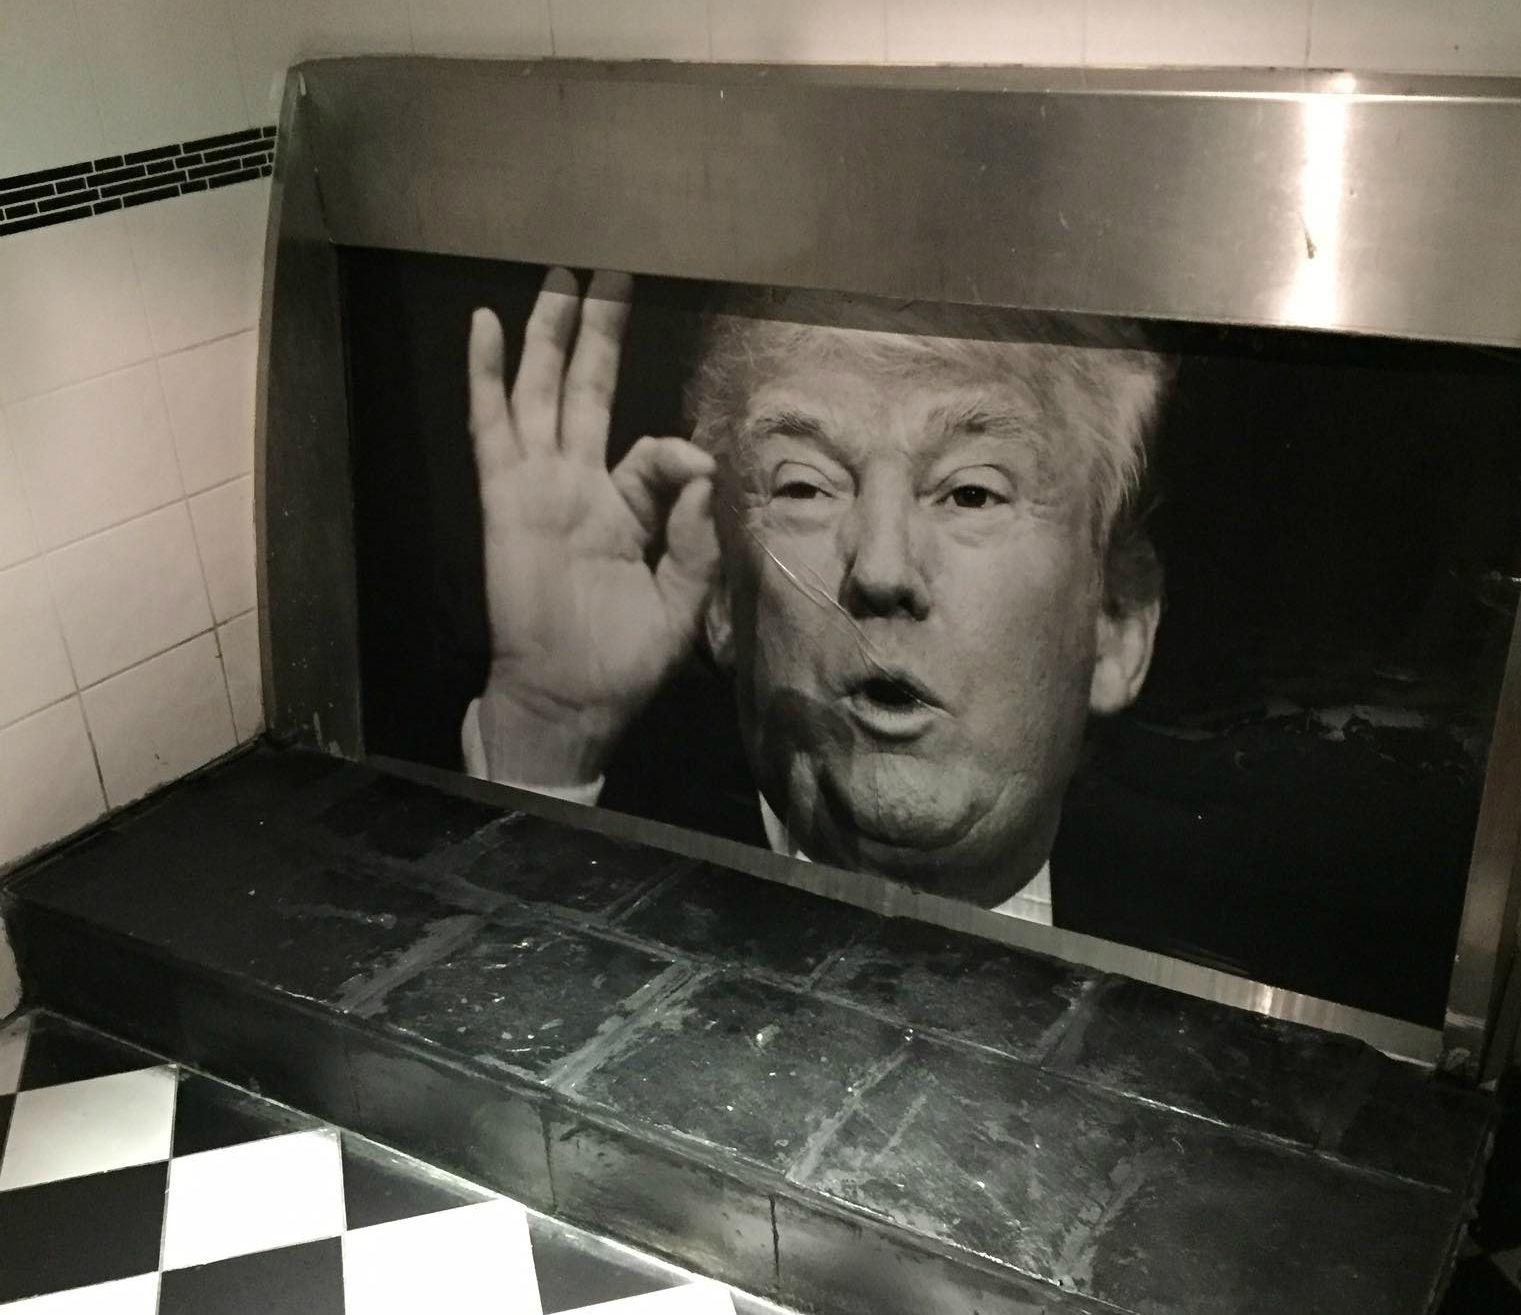 Donald Trump urinal poster in Dublin pub, the Adelphi